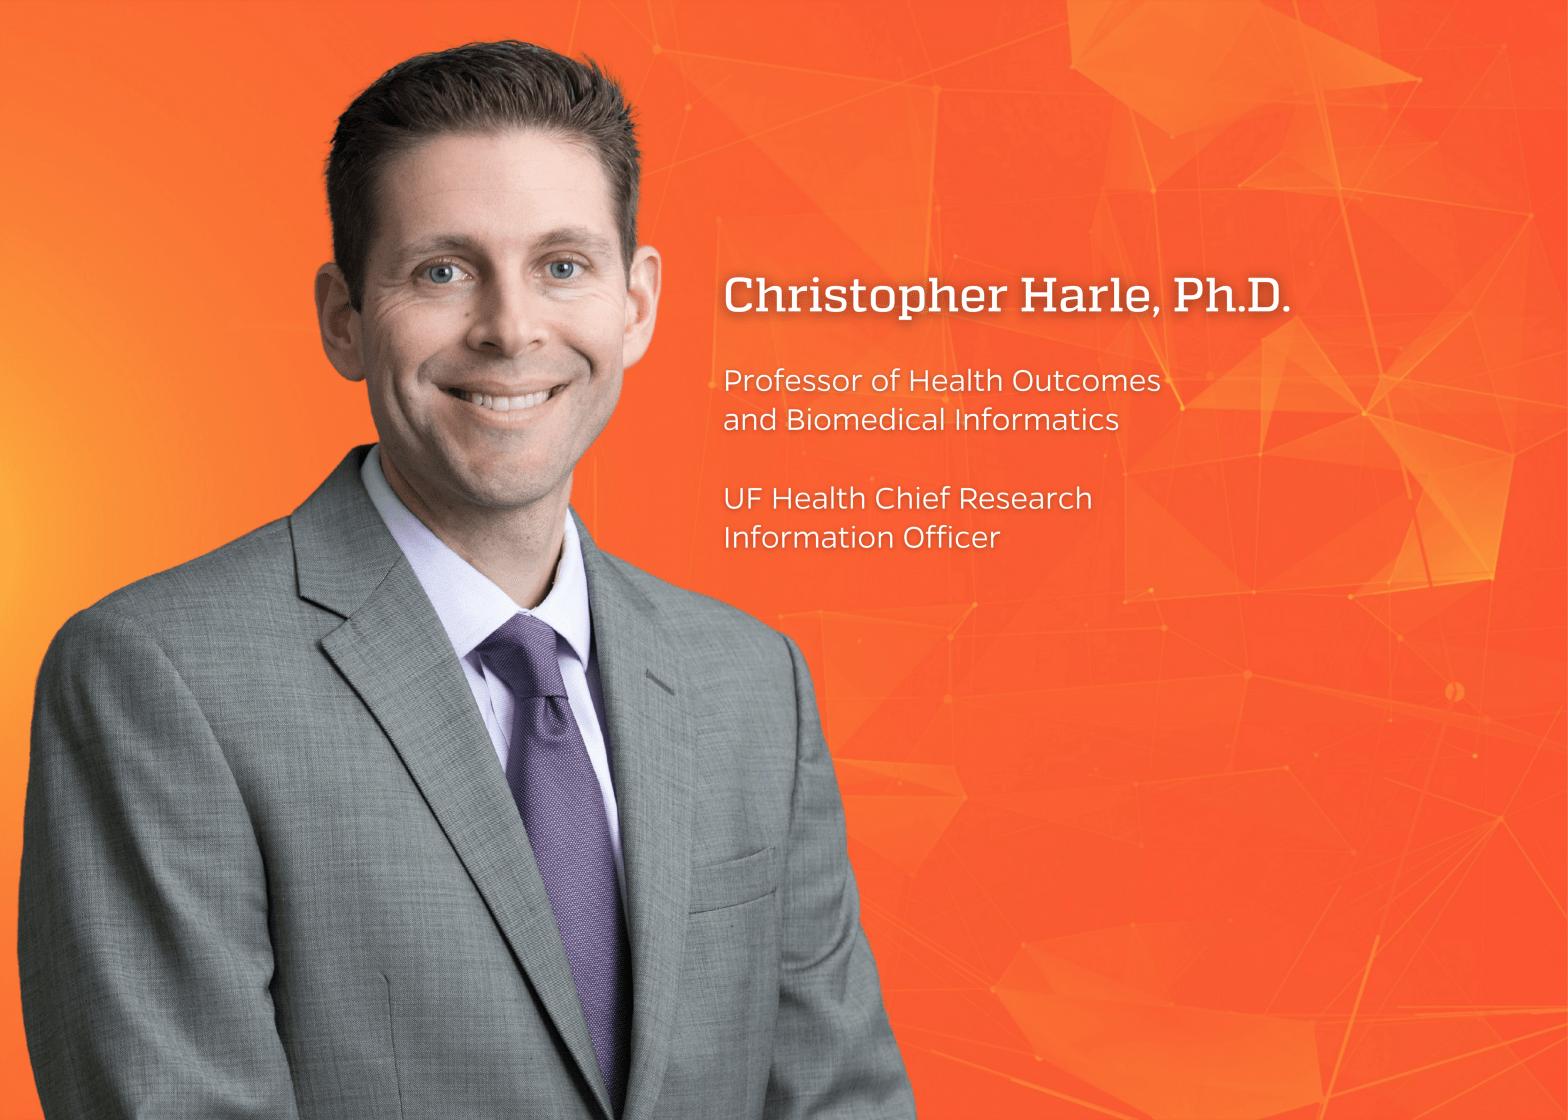 Christopher Harle